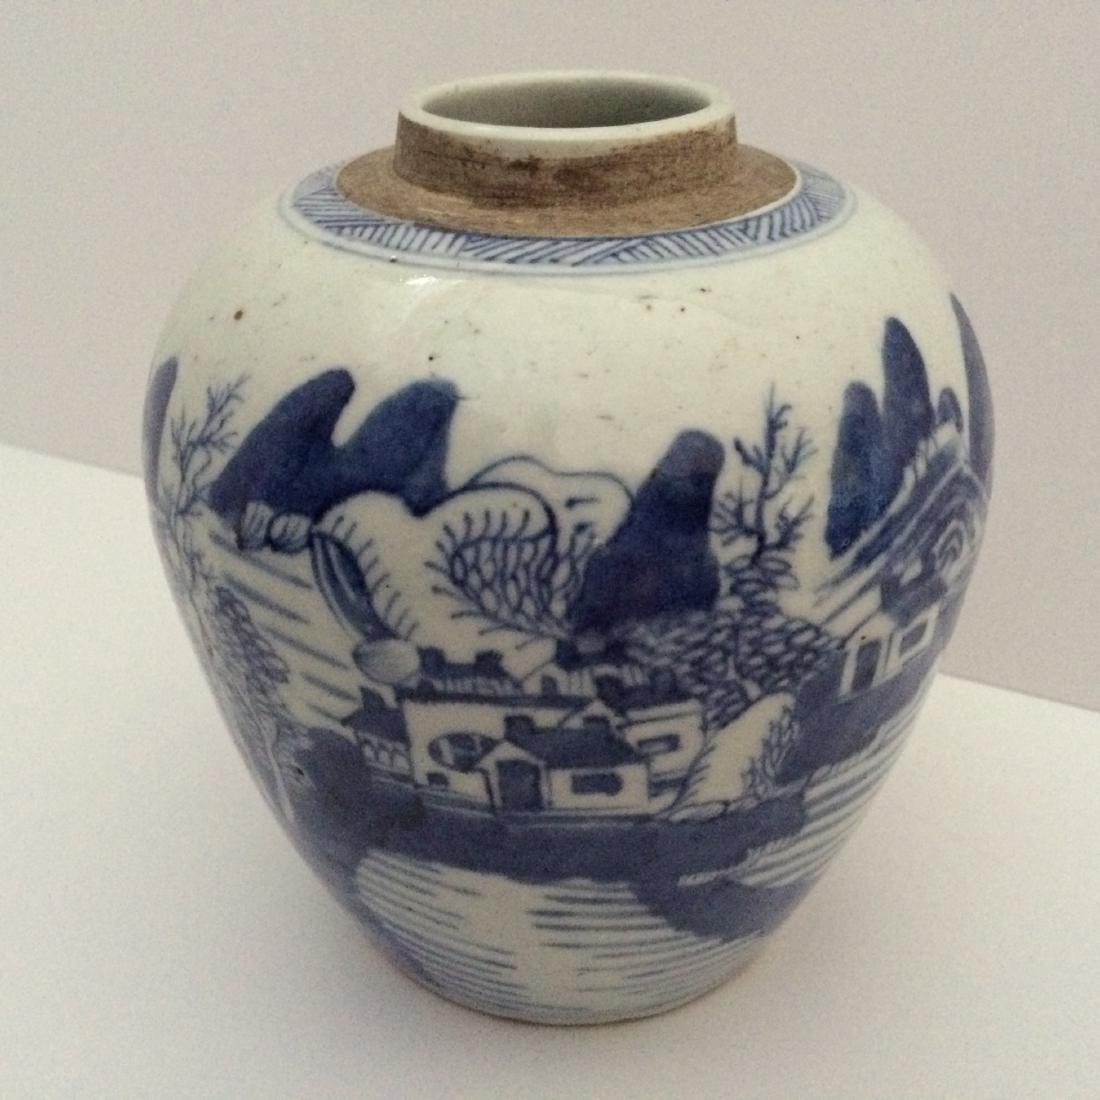 "Chinese Chin Dynasty Vase Blue Grey (5.5""H)"